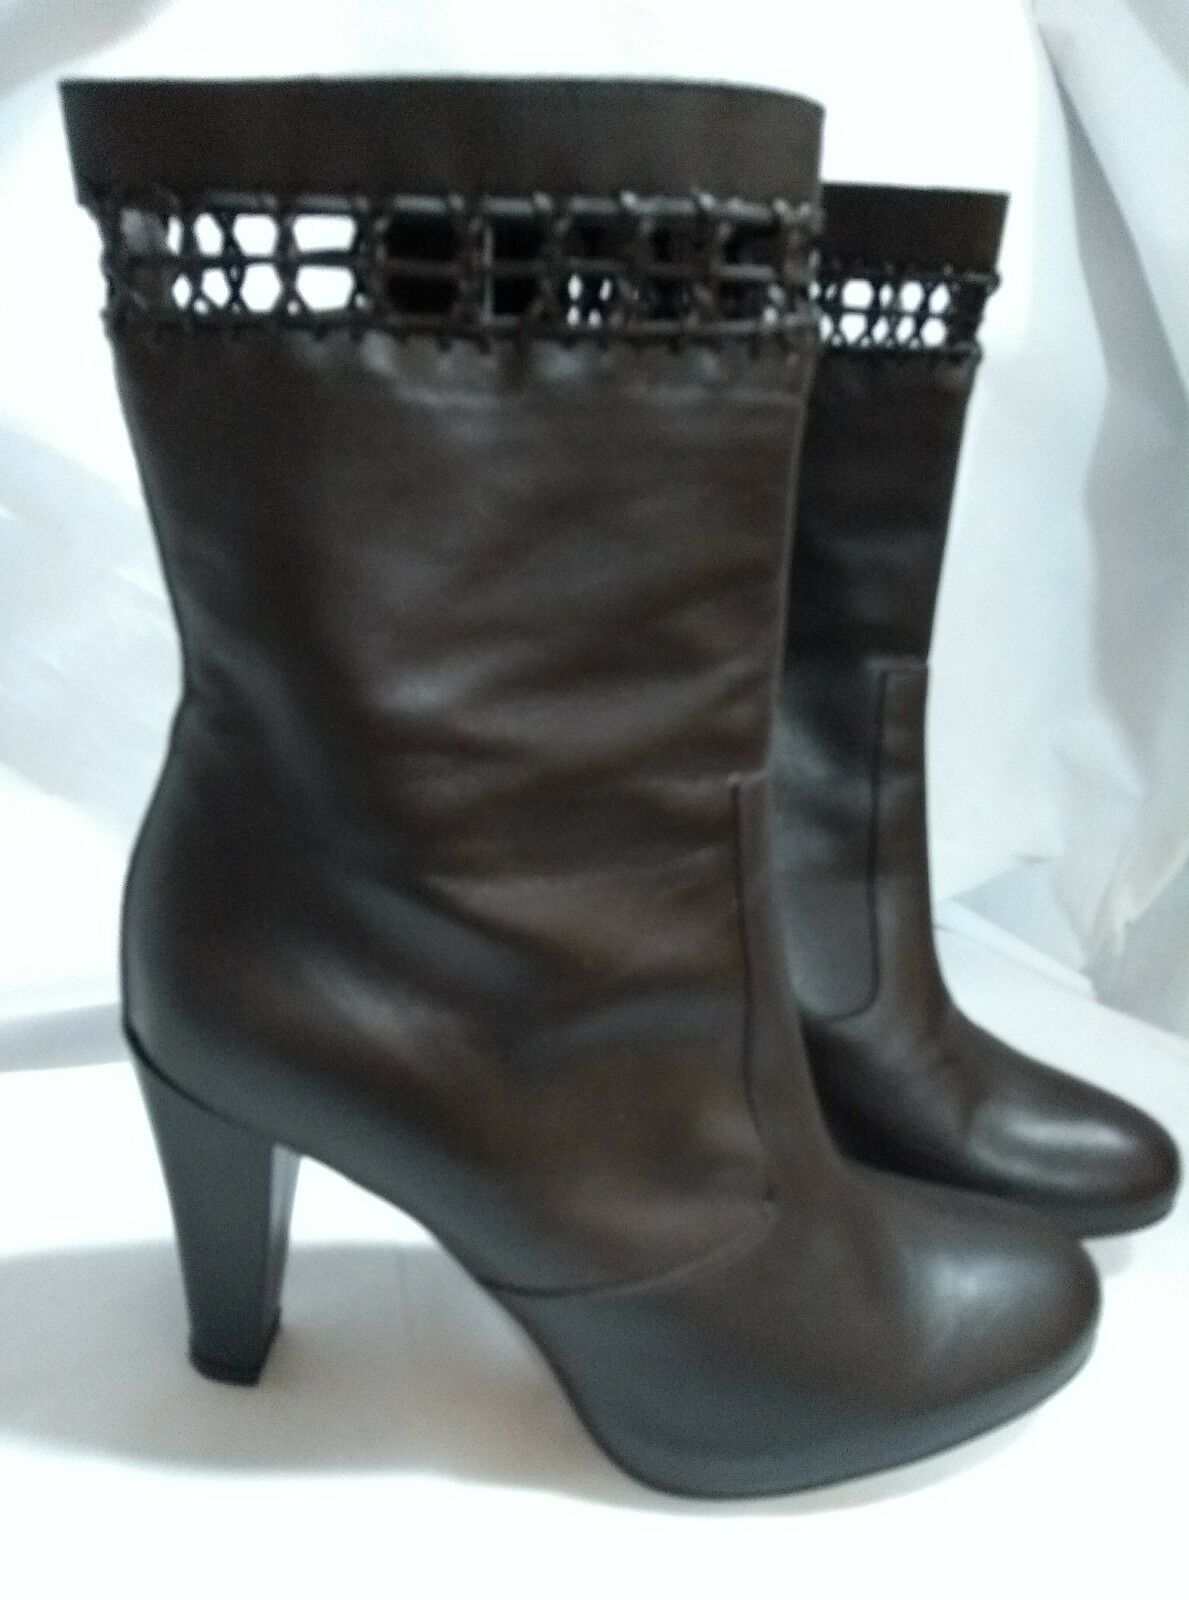 Marisa Rey Designer braun Full Leather Ankle Stiefel Heels Spain Größe 38 uk 5